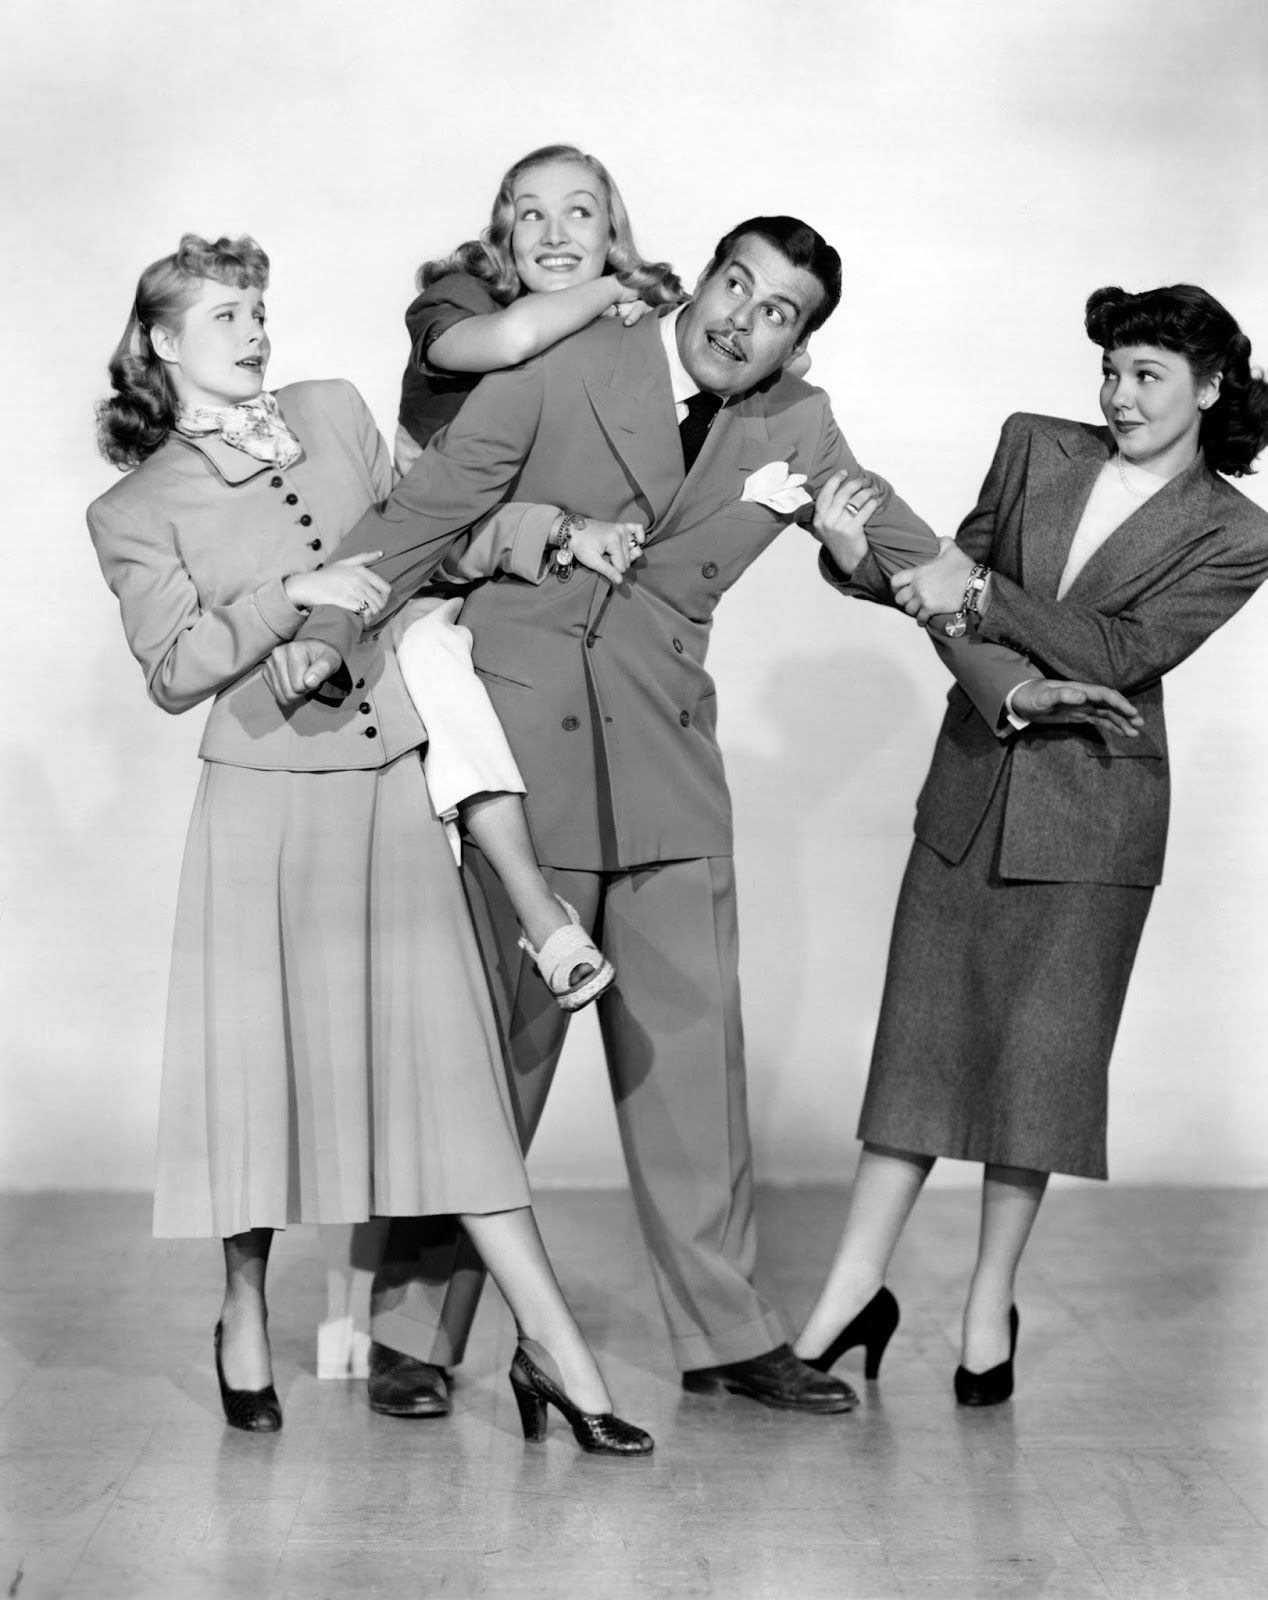 Veronica Lake, Mary Hatcher, Billy De Wolfe and Mona Freeman in ISN'T IT ROMANTIC (1948).